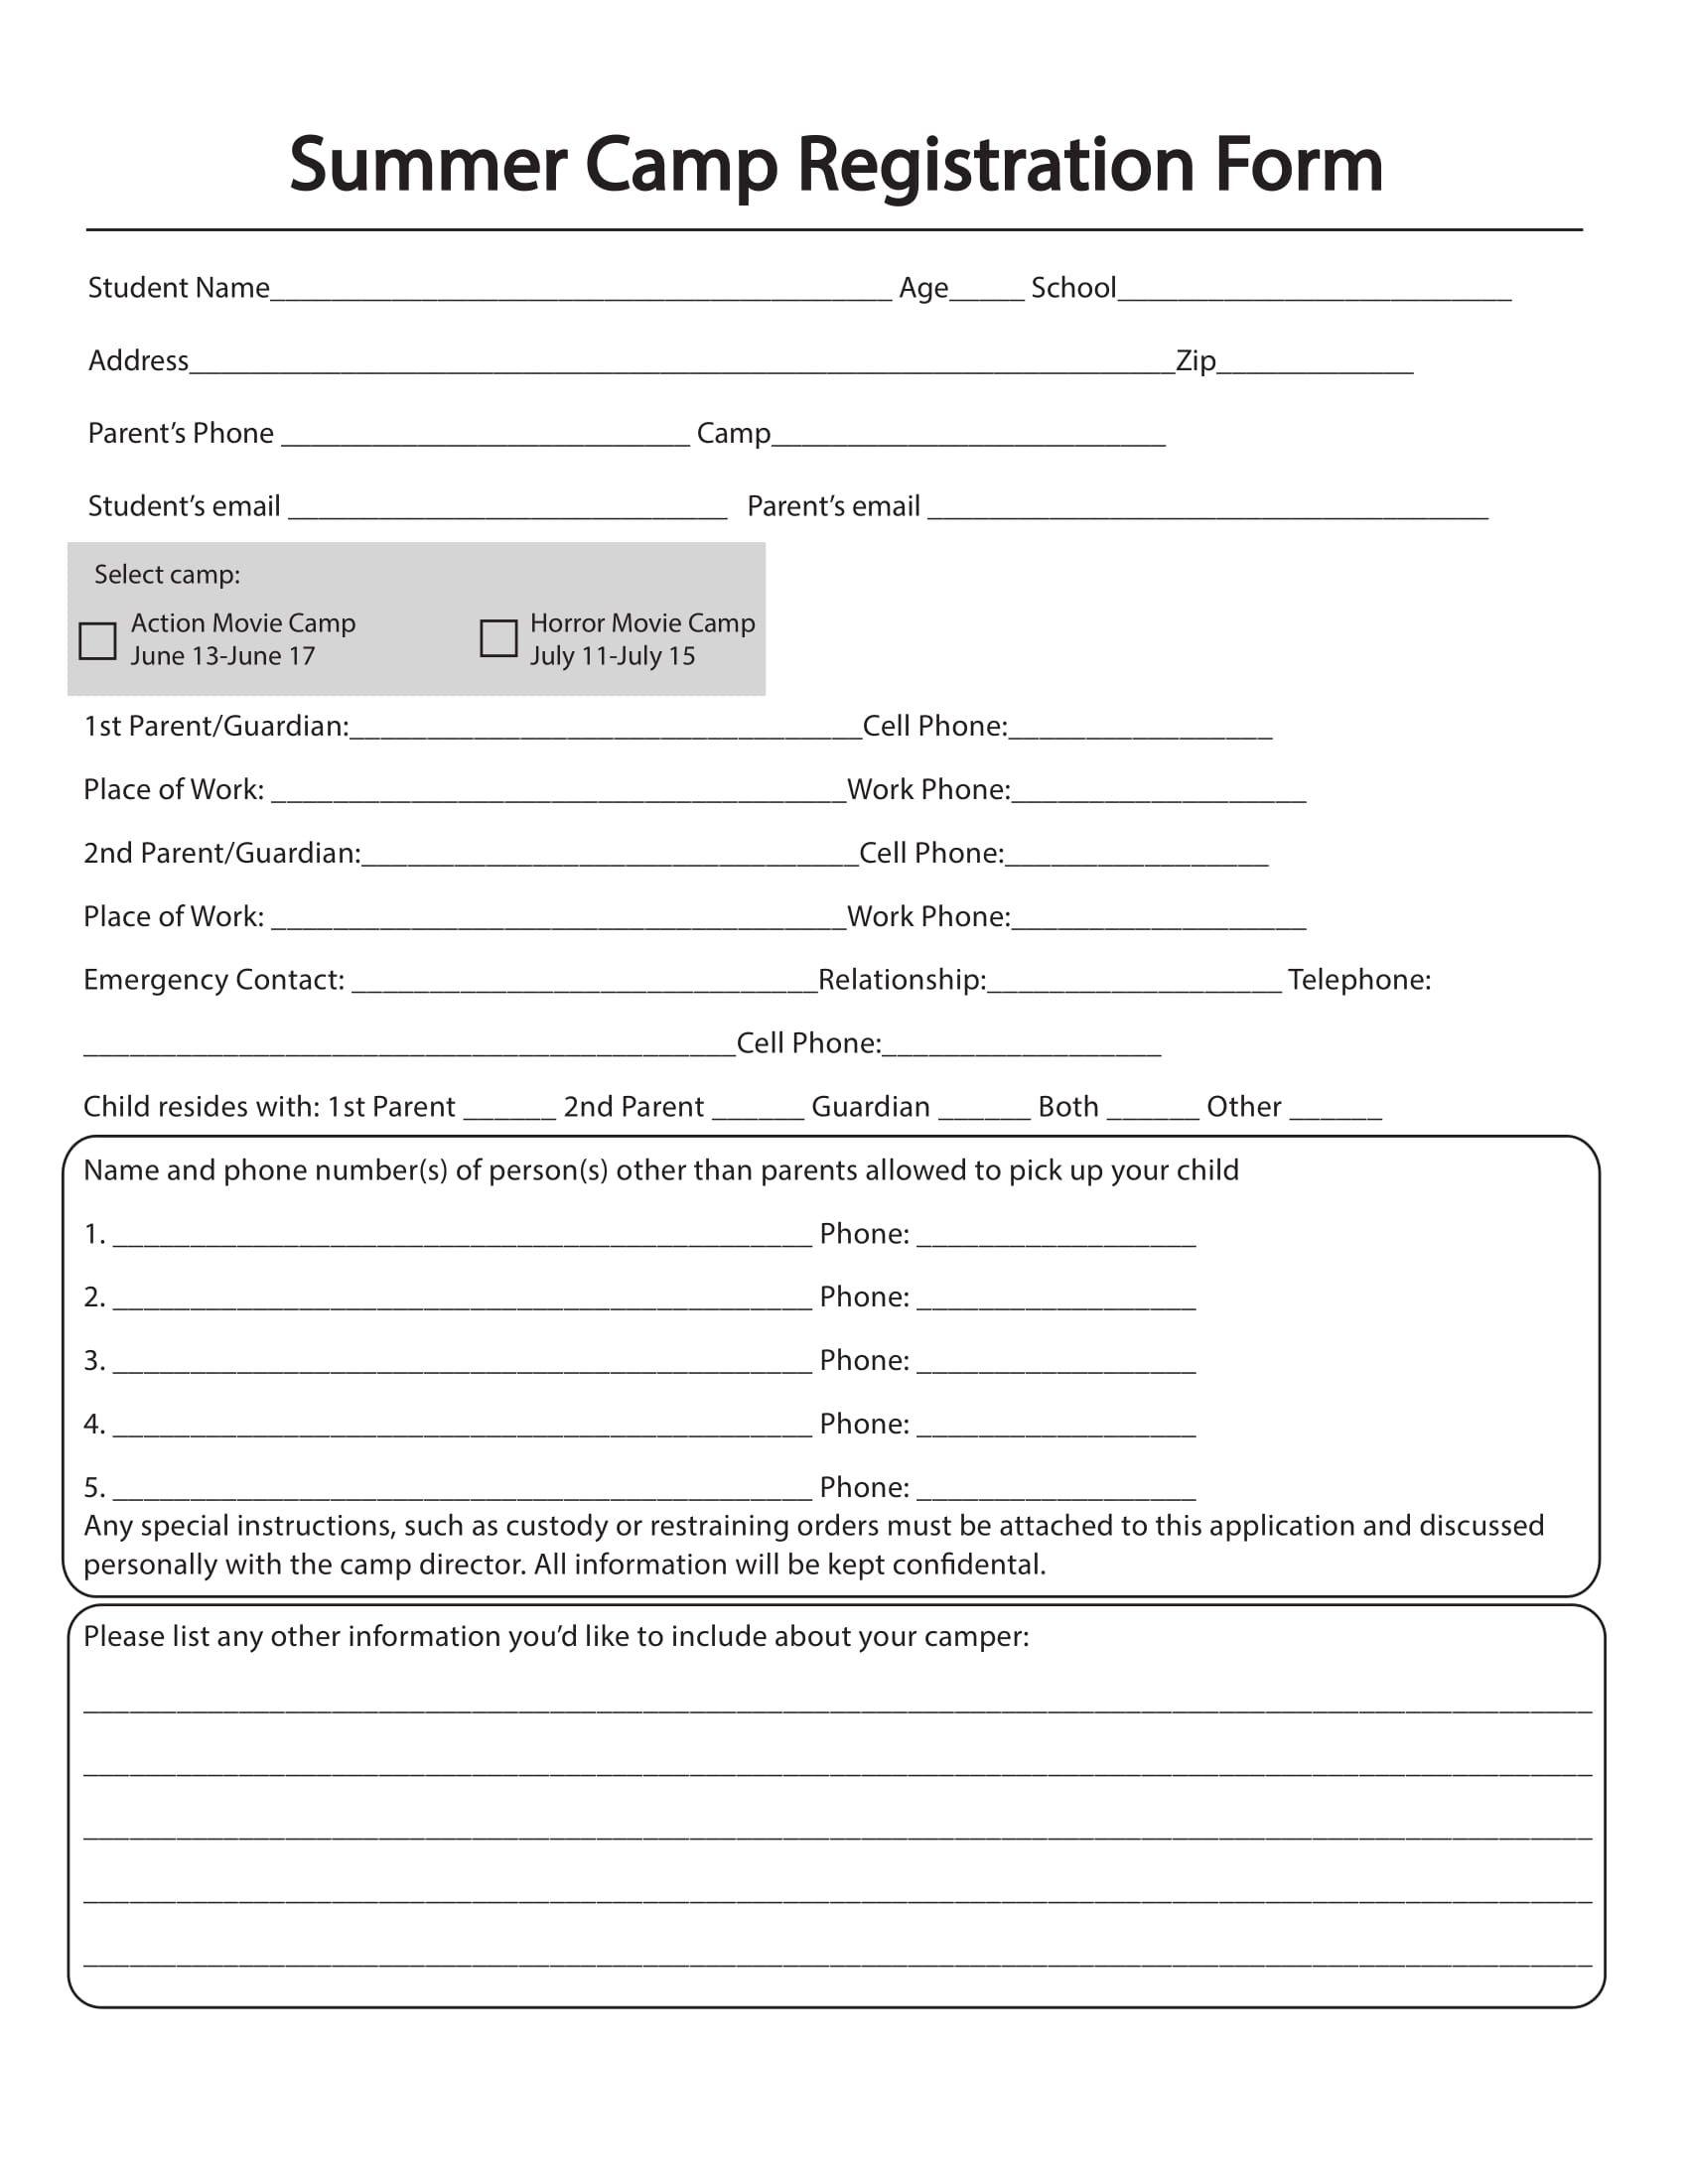 Free 10 Printable Summer Camp Registration Forms Pdf With Regard To Camp Registration Form Template Word Cumed Registration Form Budget Template Templates